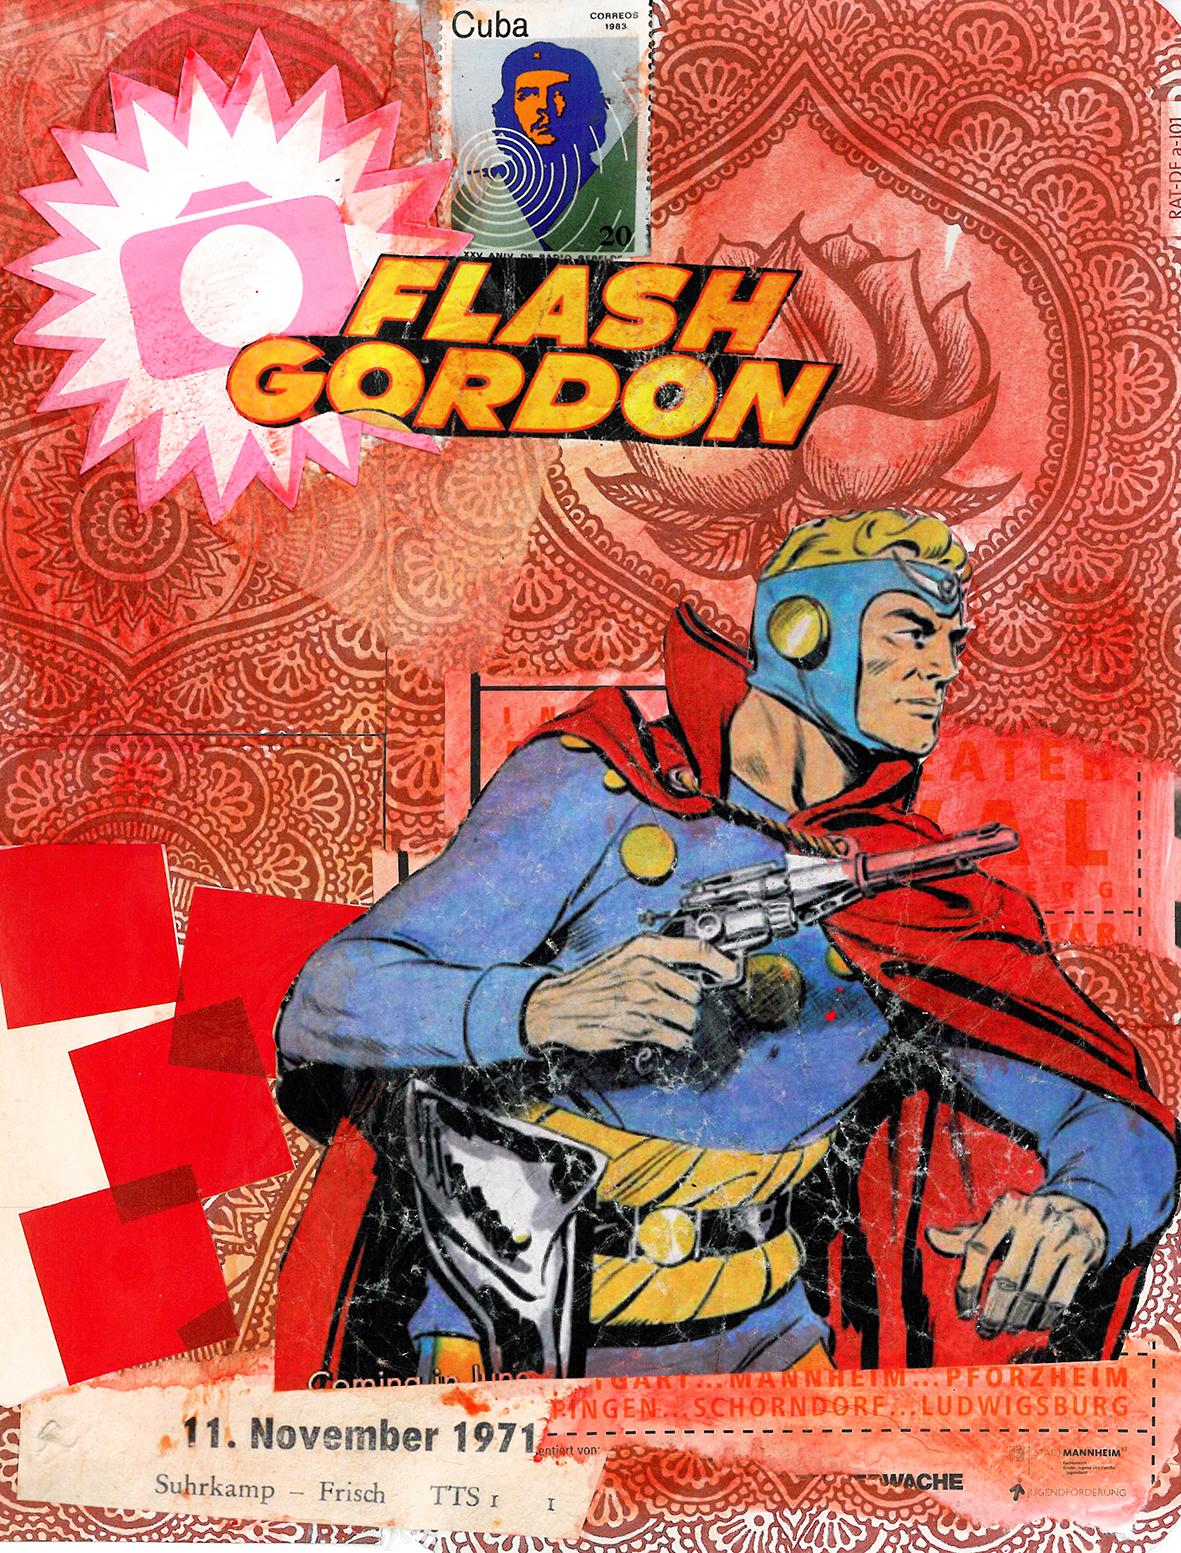 FlashGordon_ULRICH